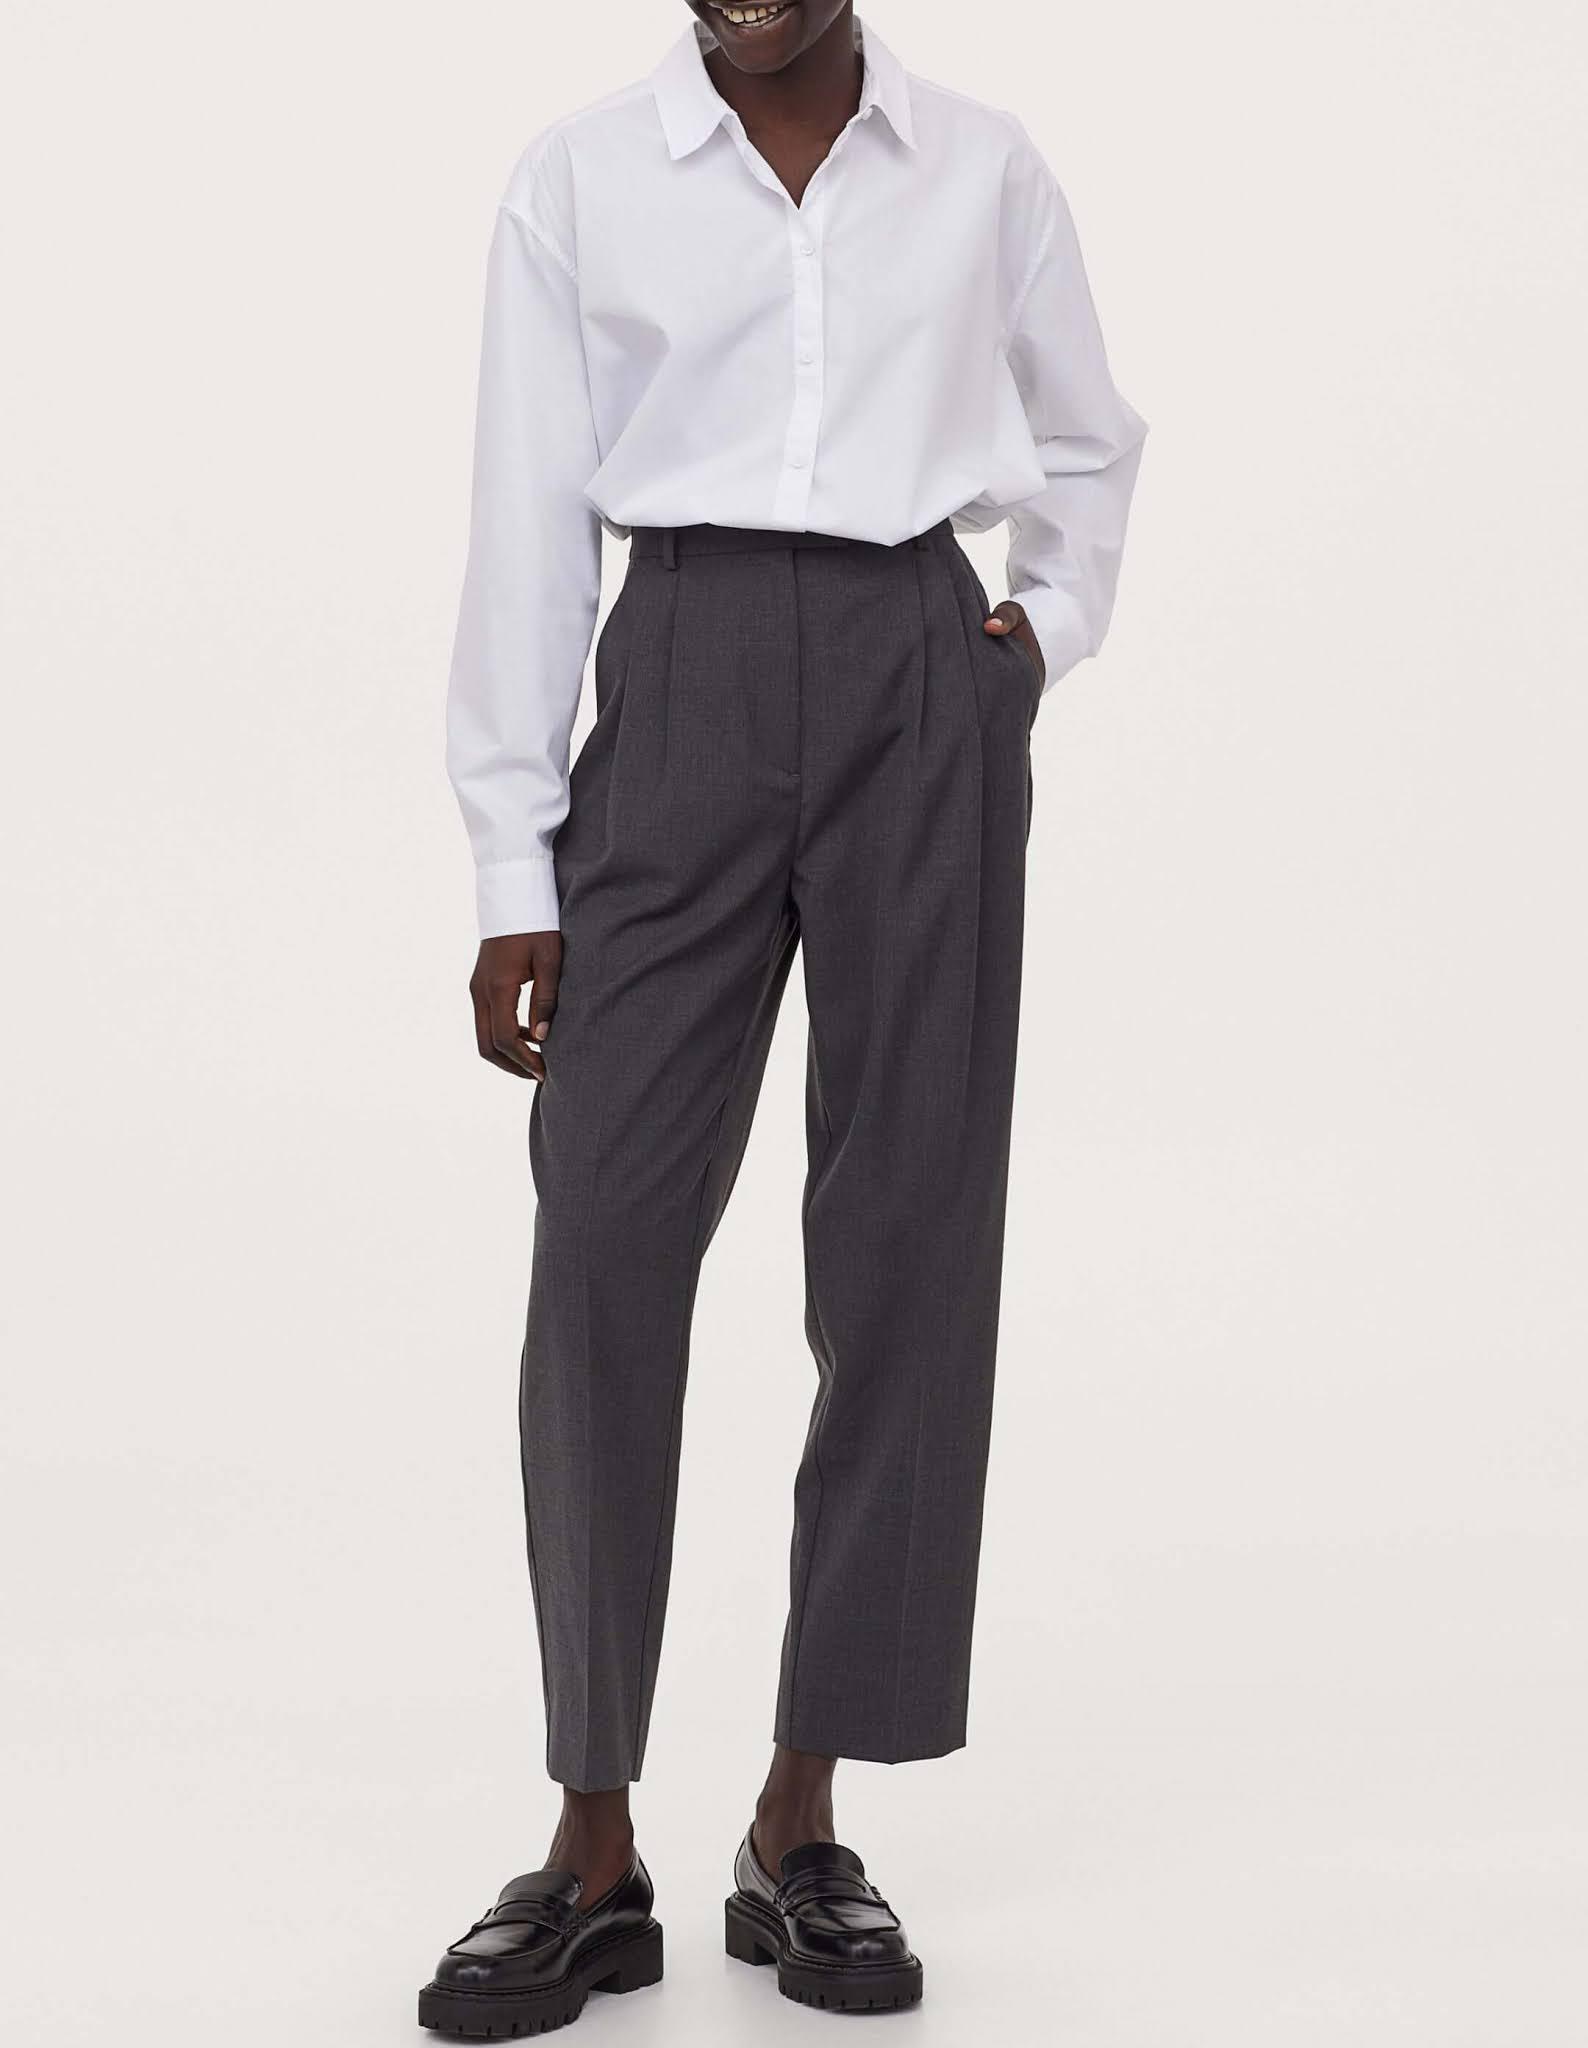 gray creased pants